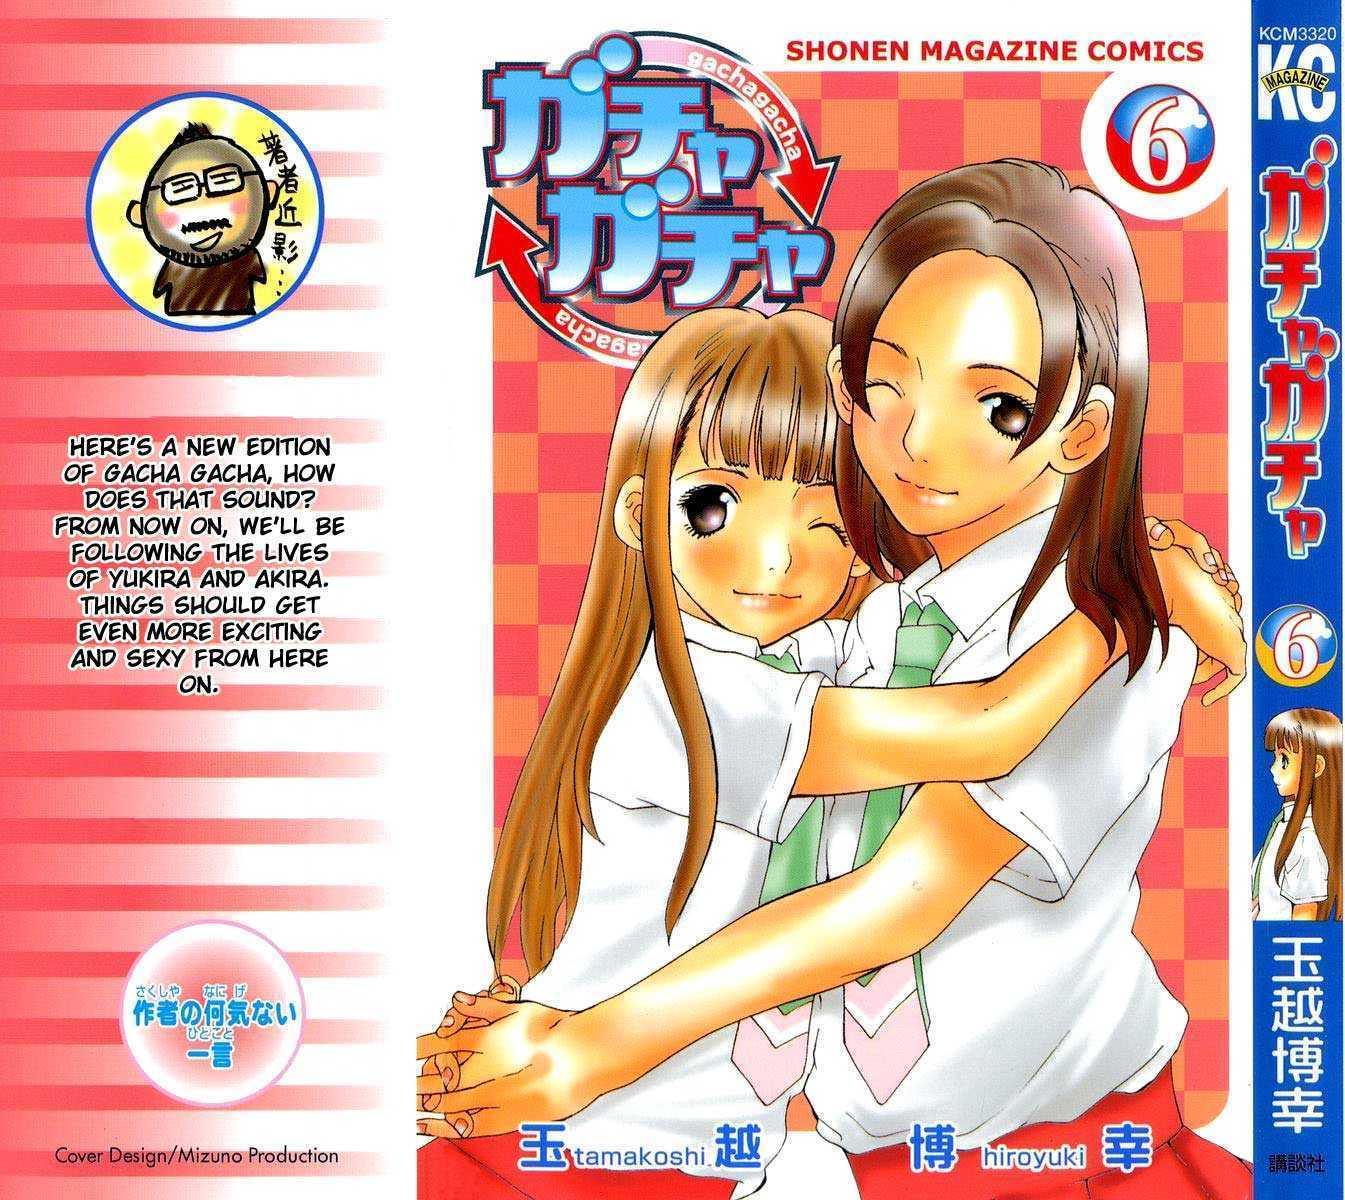 Gacha Gacha 1: Let's Make New Friends! at MangaFox